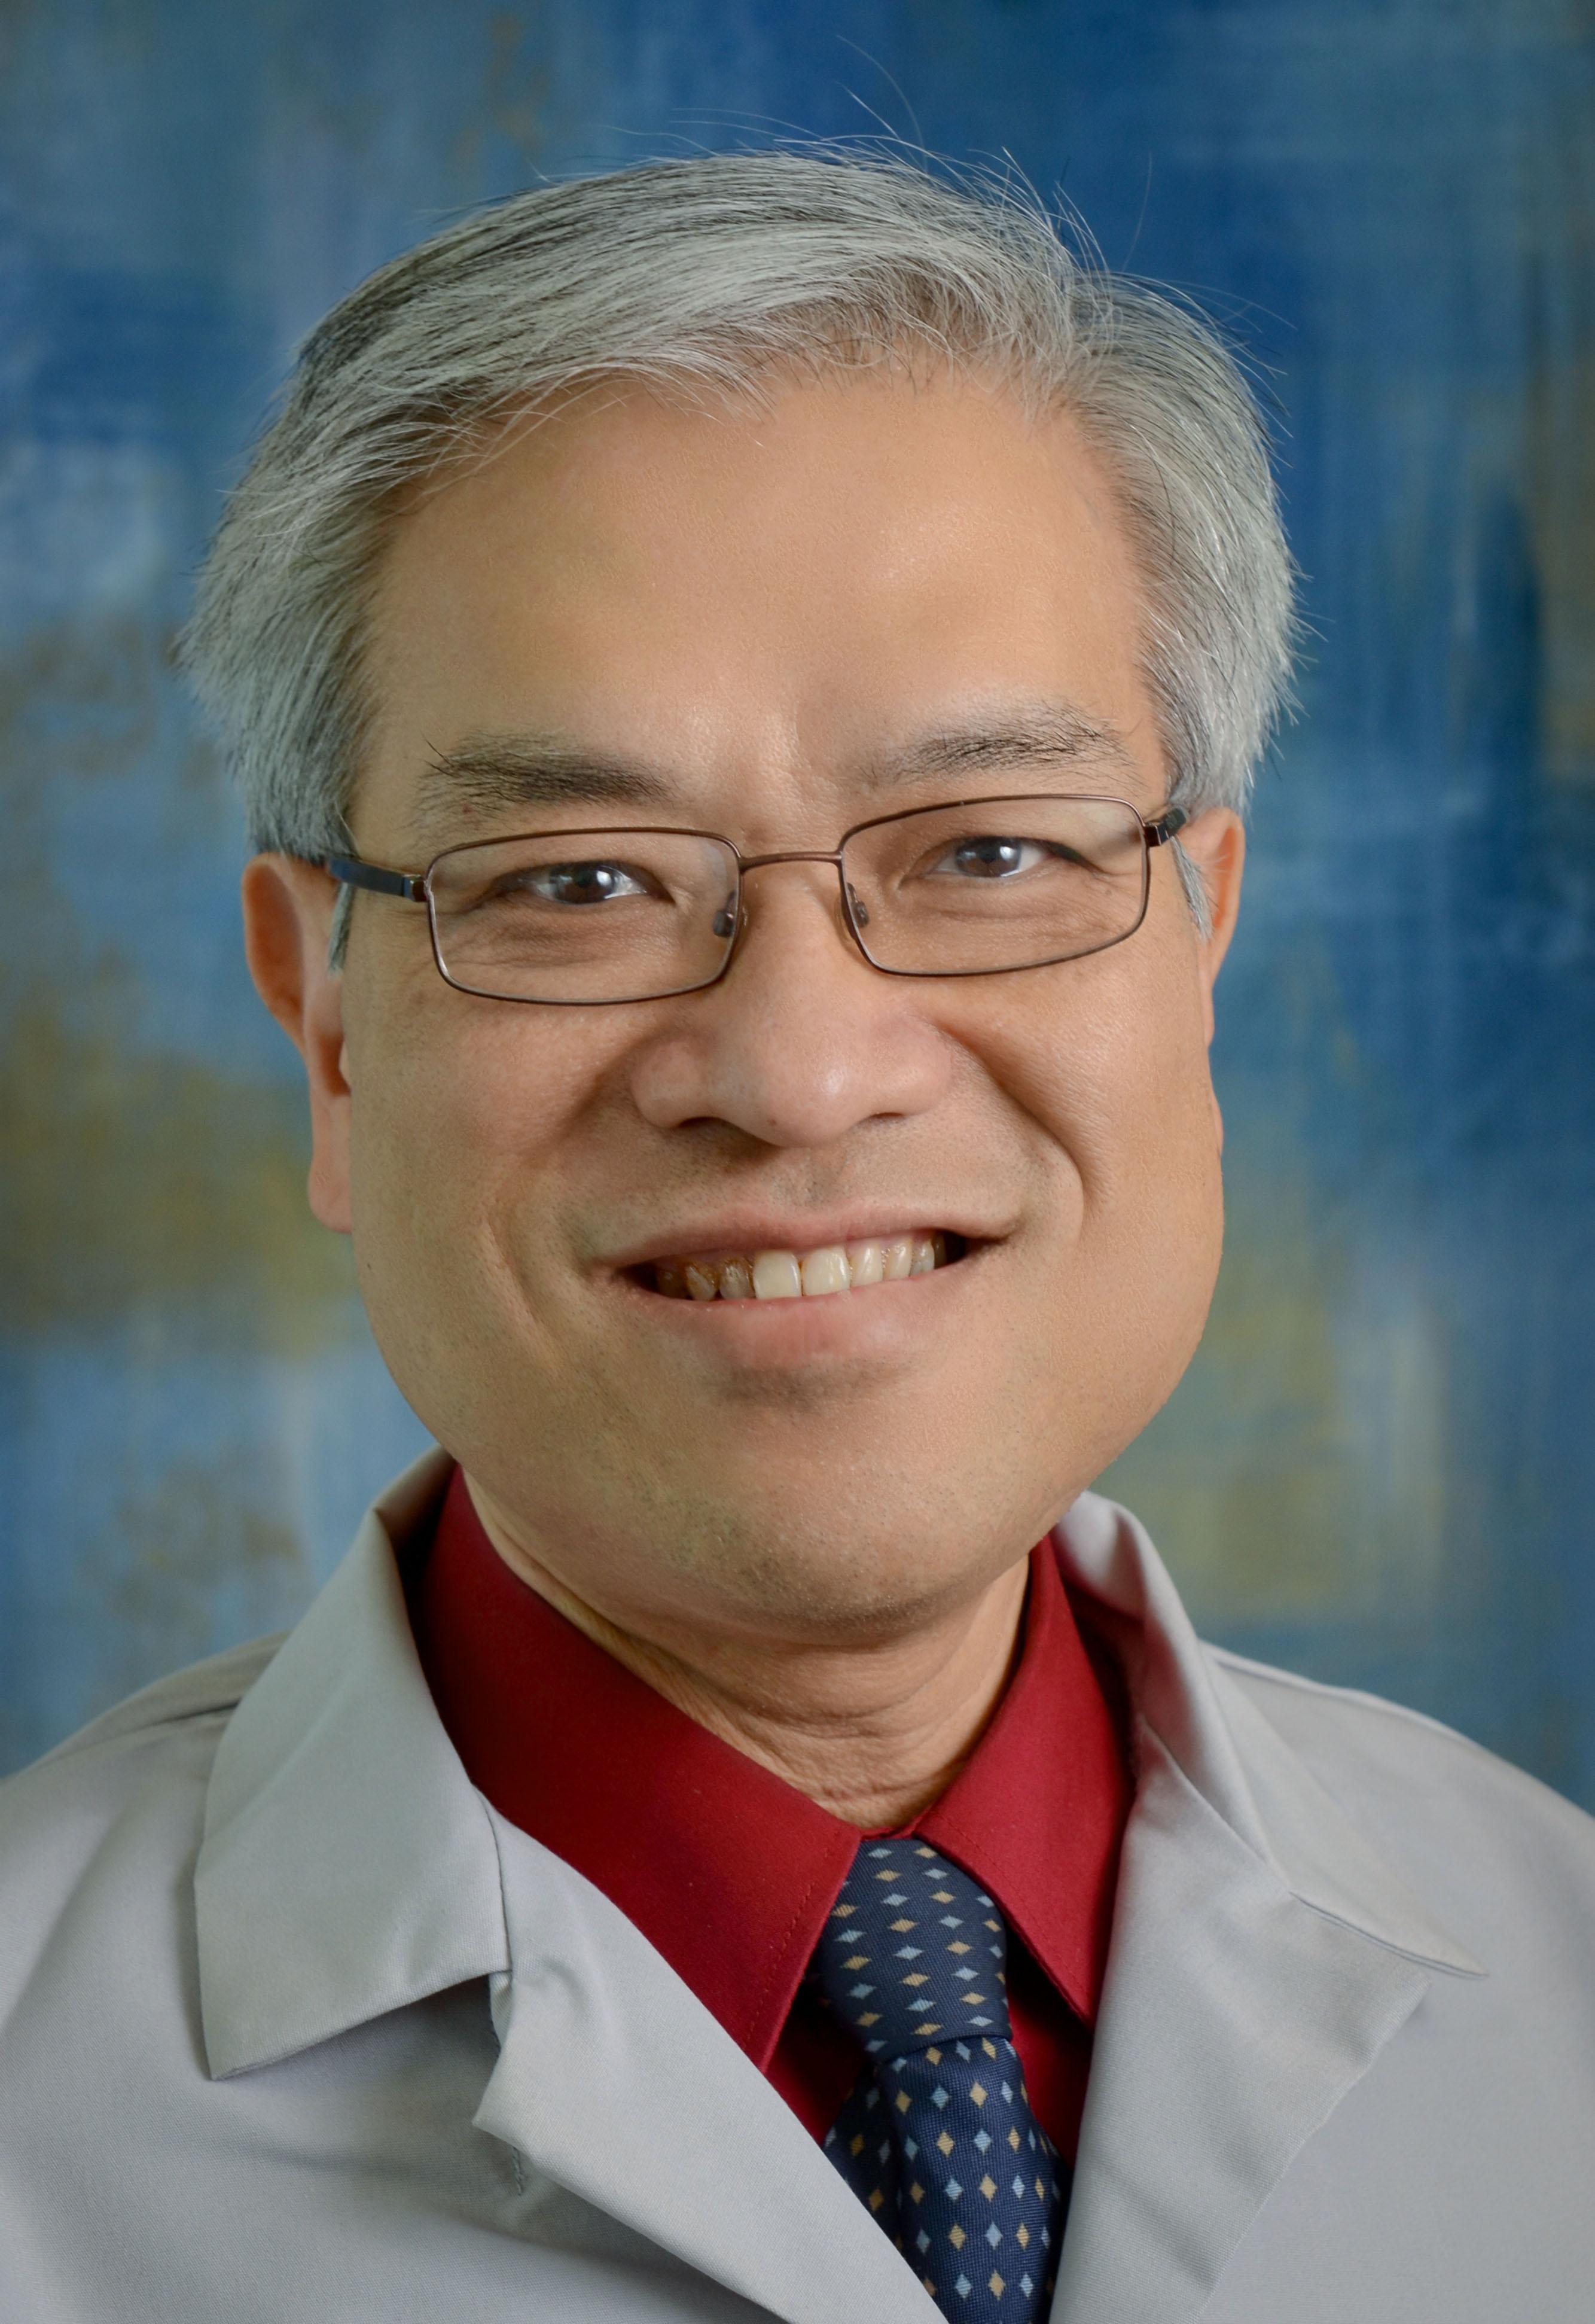 Benjamin Tan Go, MD